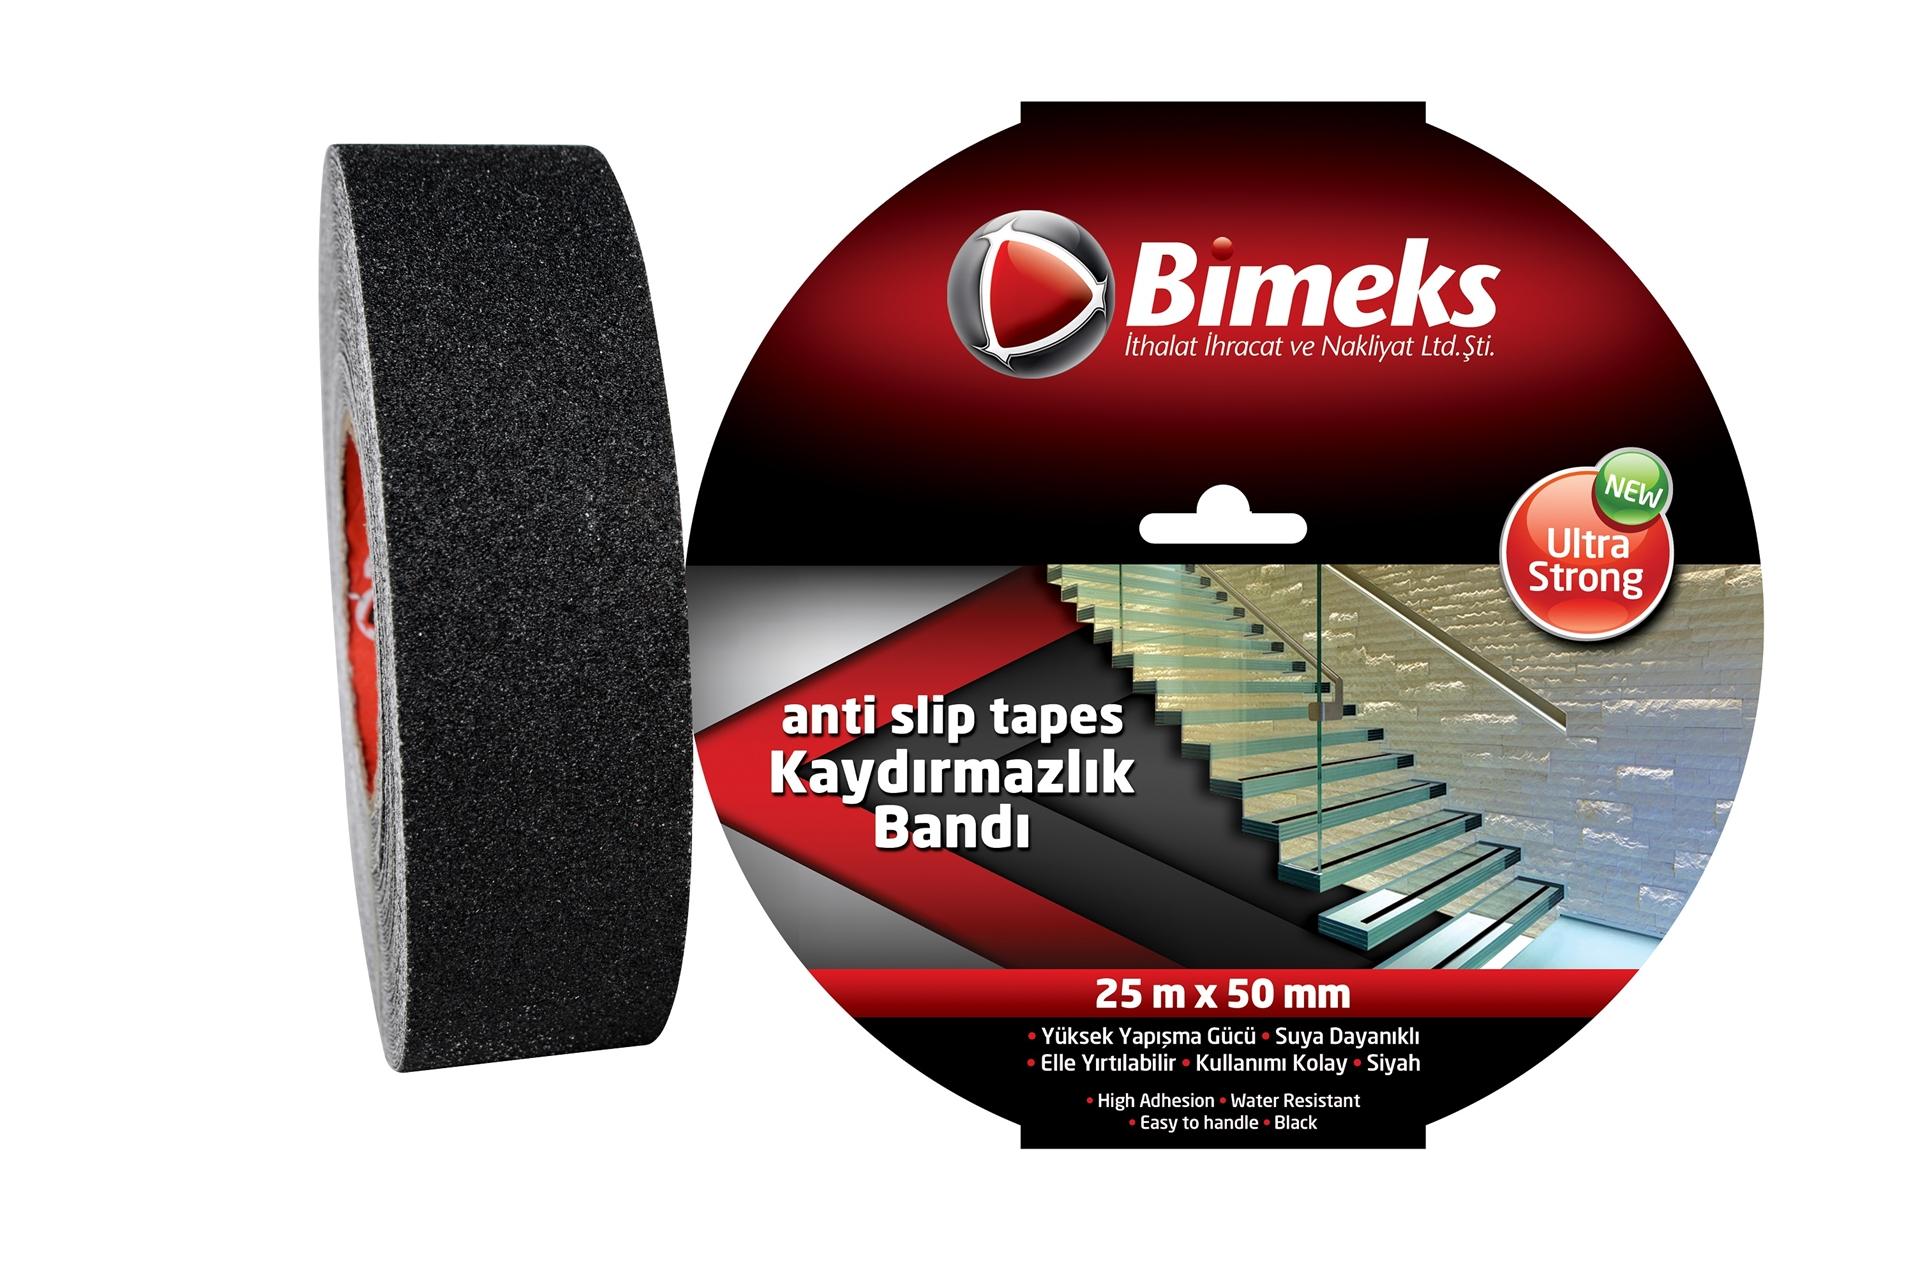 Bimeks Siyah Kaydırmazlık Bandı 25mtx50mm